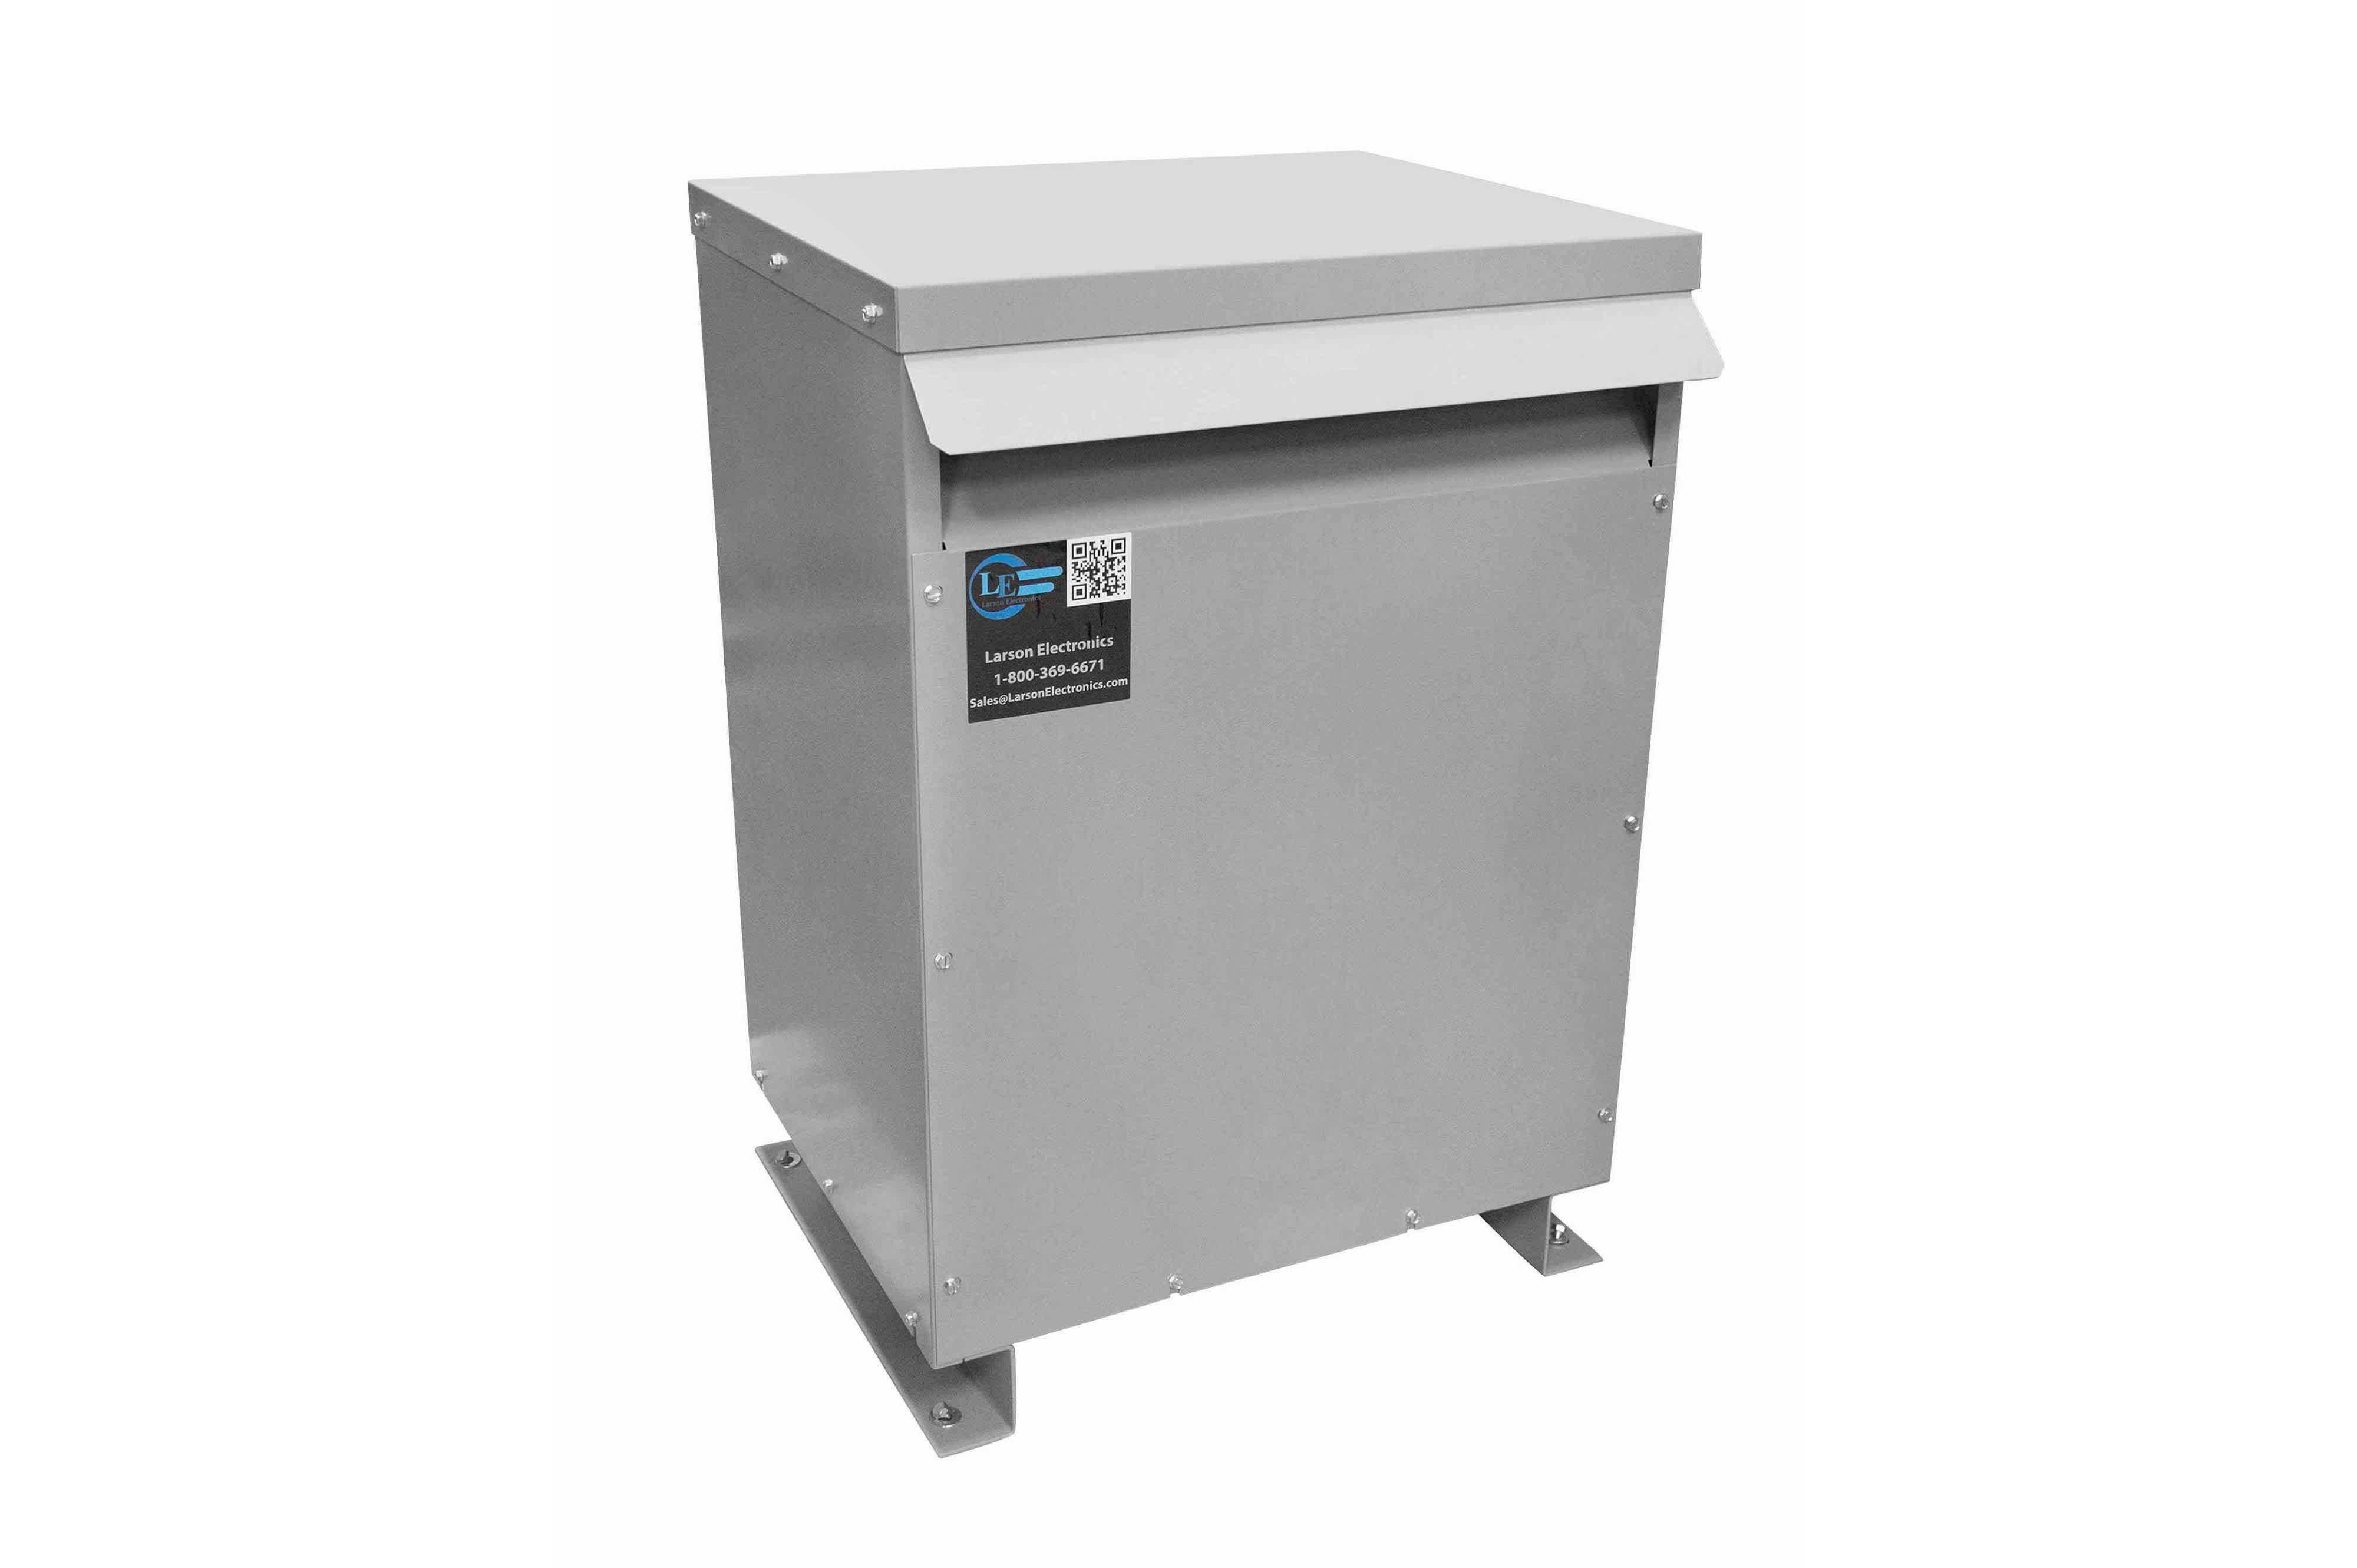 75 kVA 3PH Isolation Transformer, 440V Wye Primary, 240V/120 Delta Secondary, N3R, Ventilated, 60 Hz